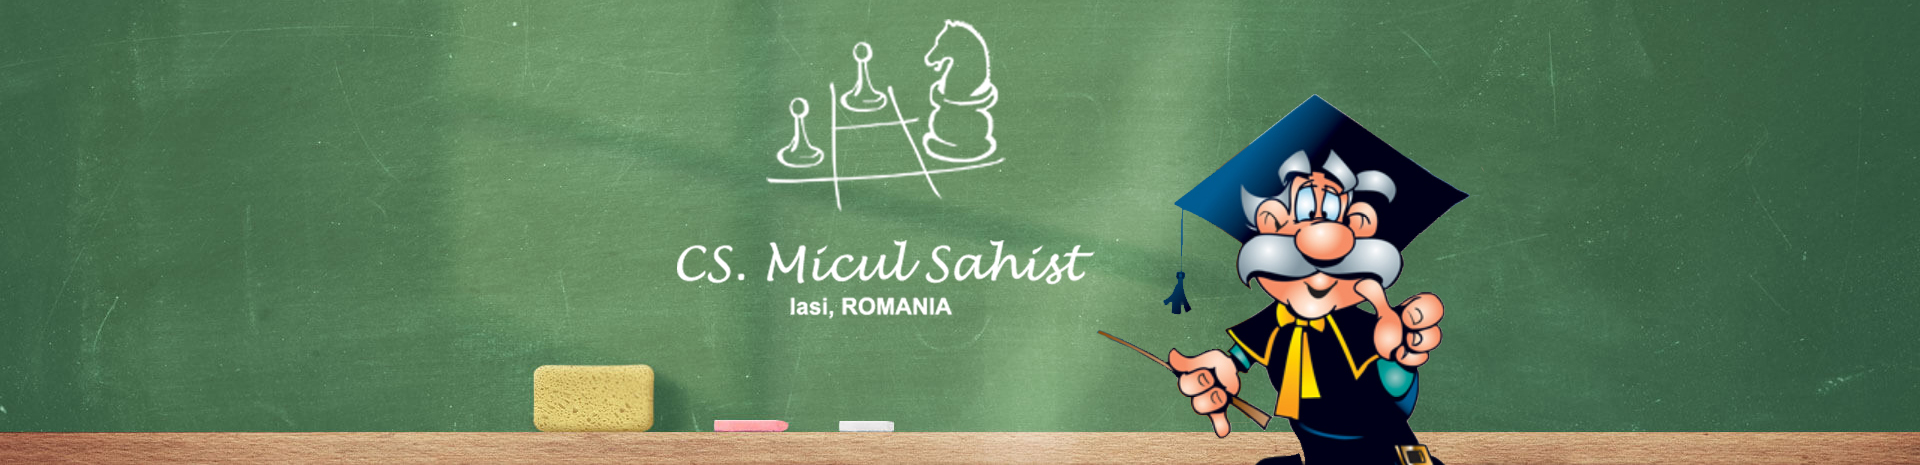 C. S. Micul Sahist – Iasi